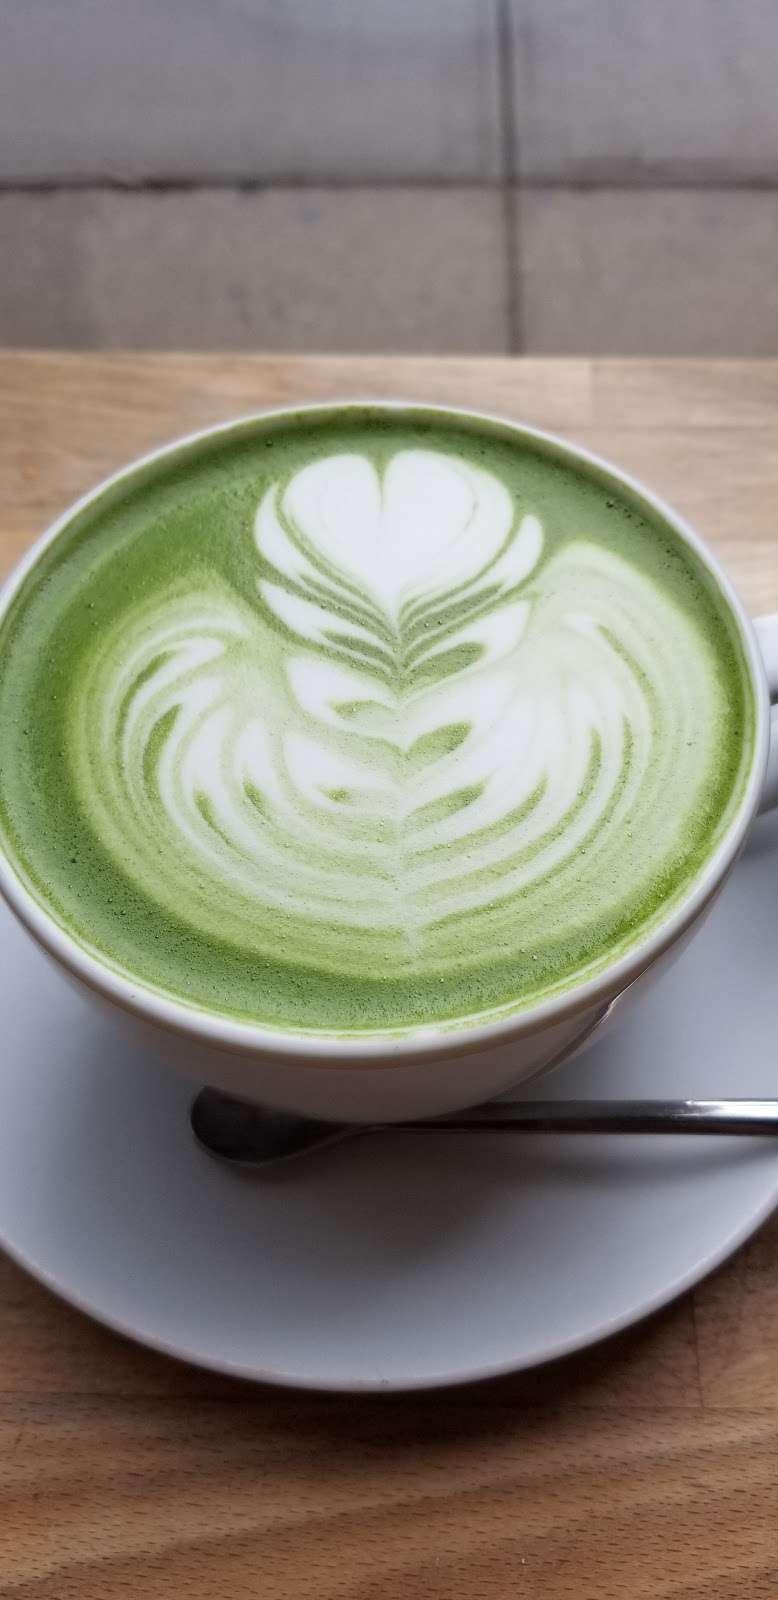 Astoria Coffee - cafe  | Photo 7 of 10 | Address: 30-04 30th St, Astoria, NY 11102, USA | Phone: (347) 619-3915